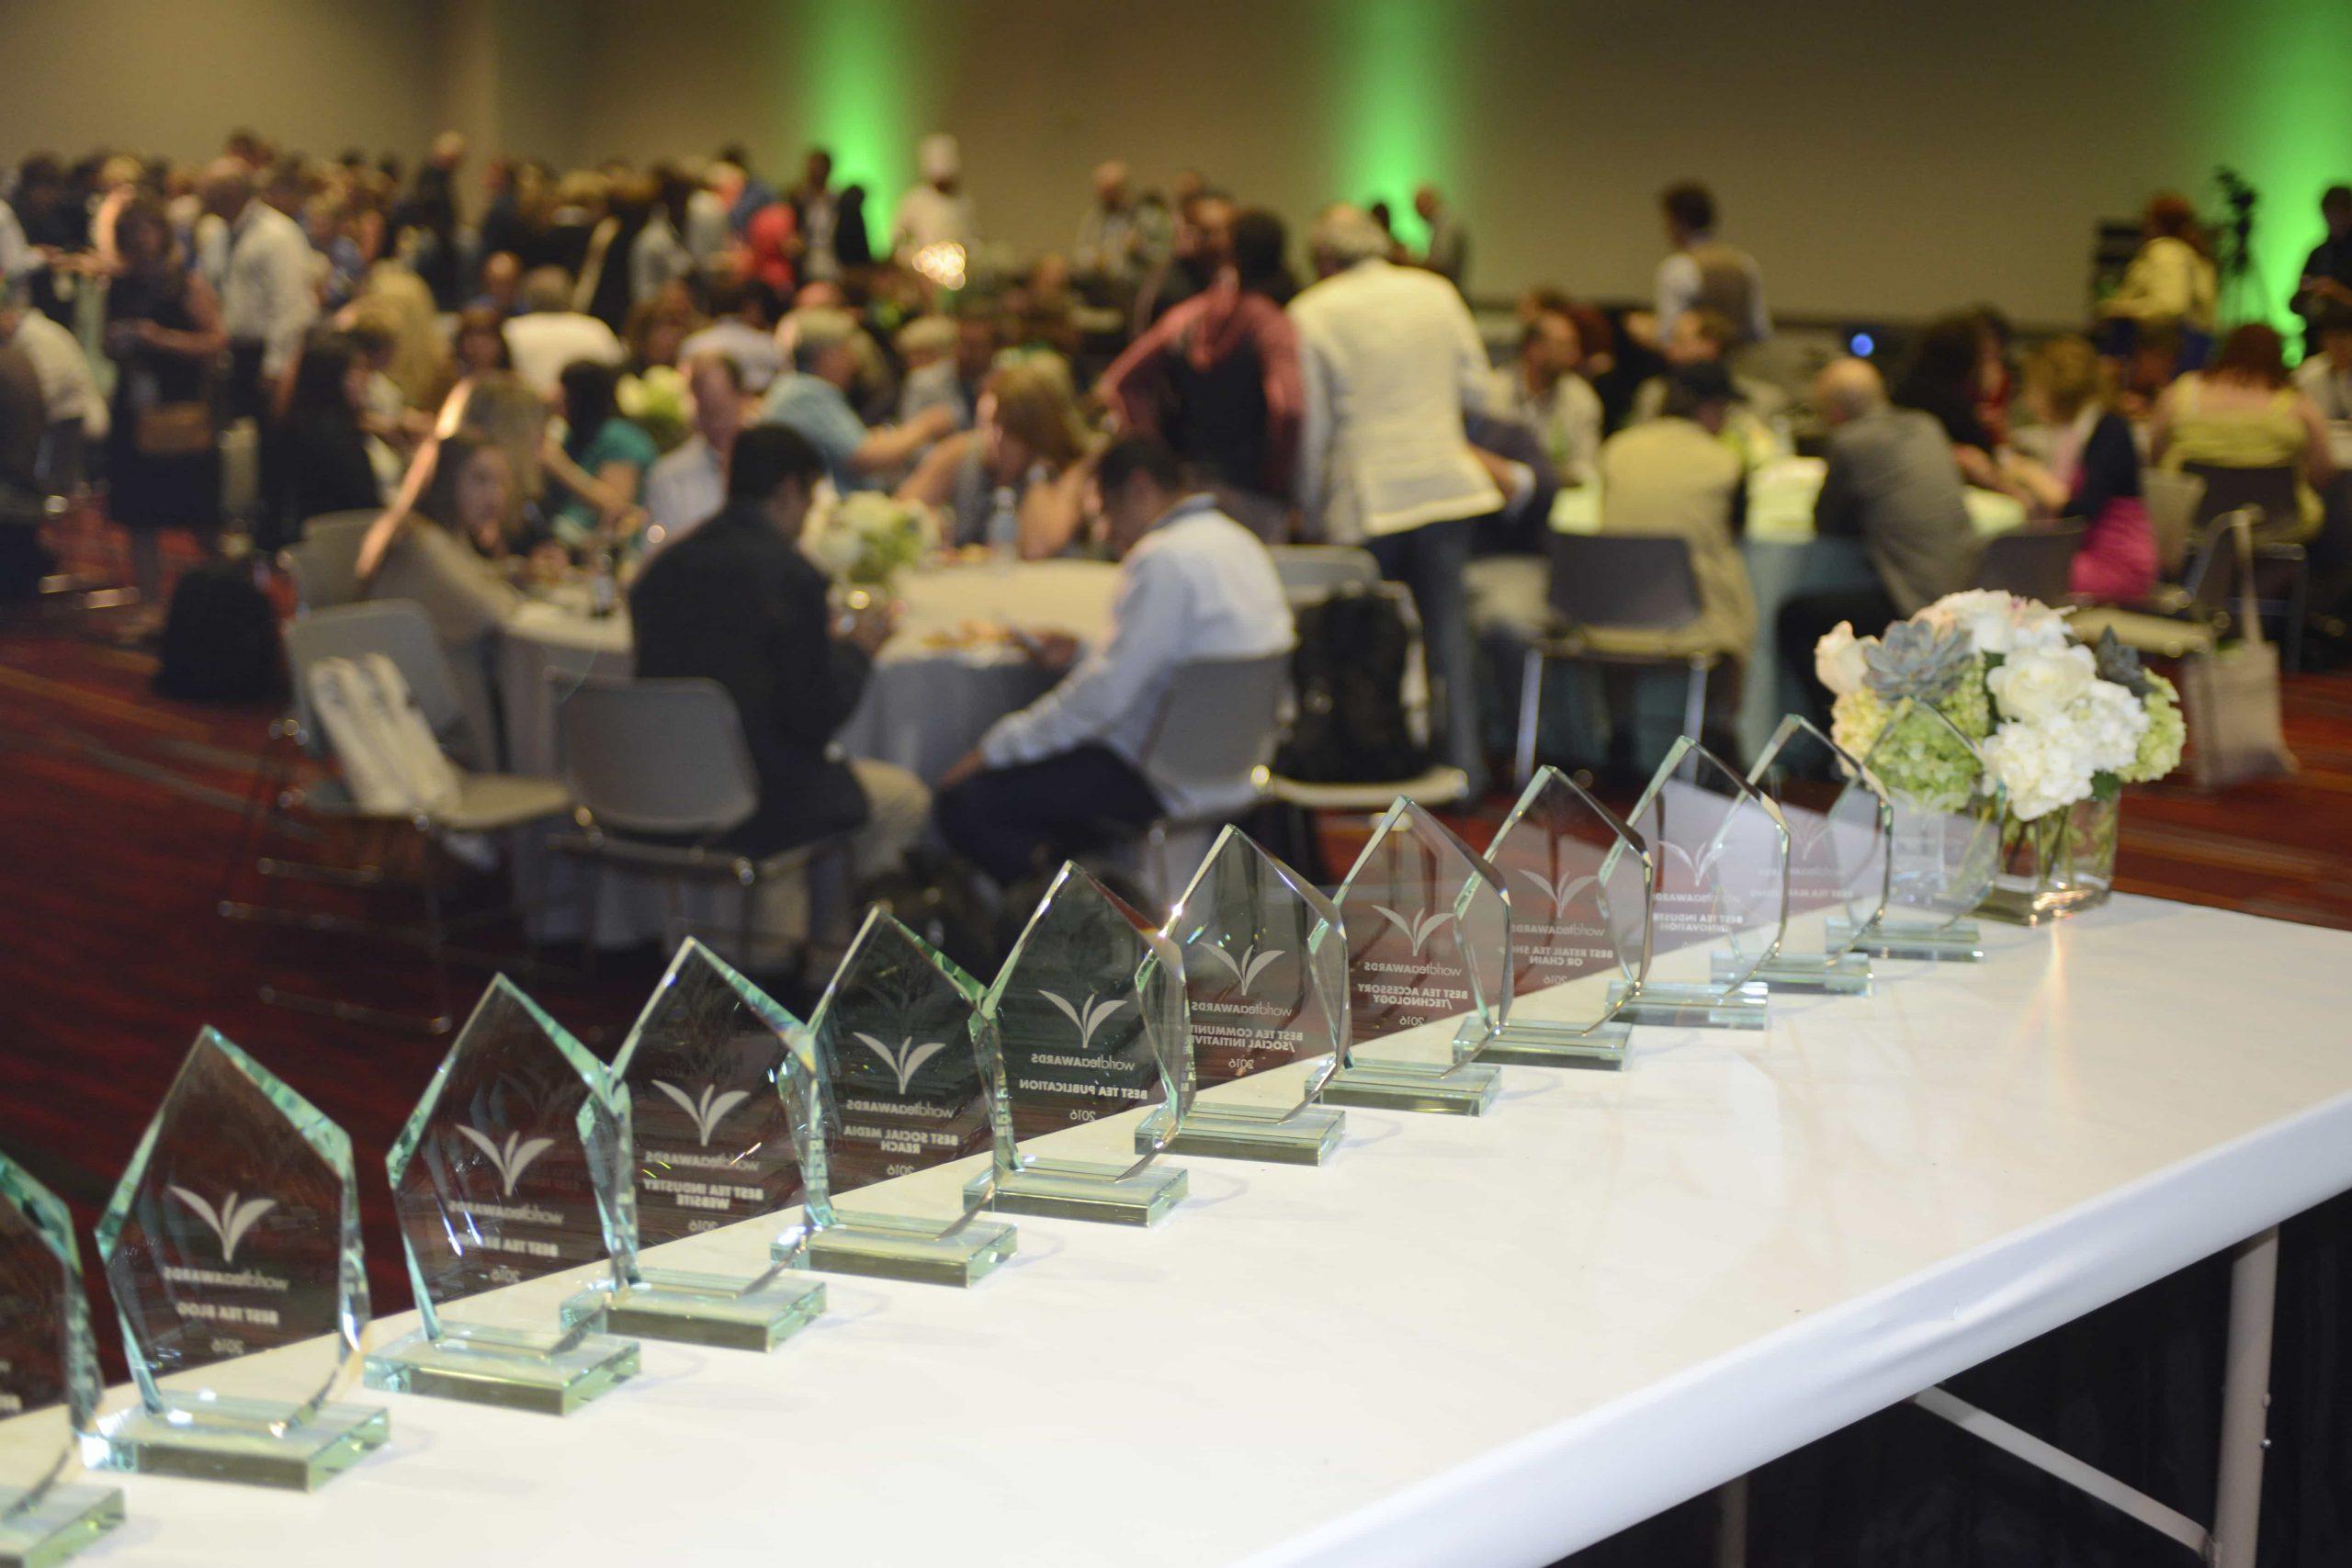 World Tea Expo's 'World Tea Awards' to Honor Contributors to Specialty Tea's Growth, Innovation, Education